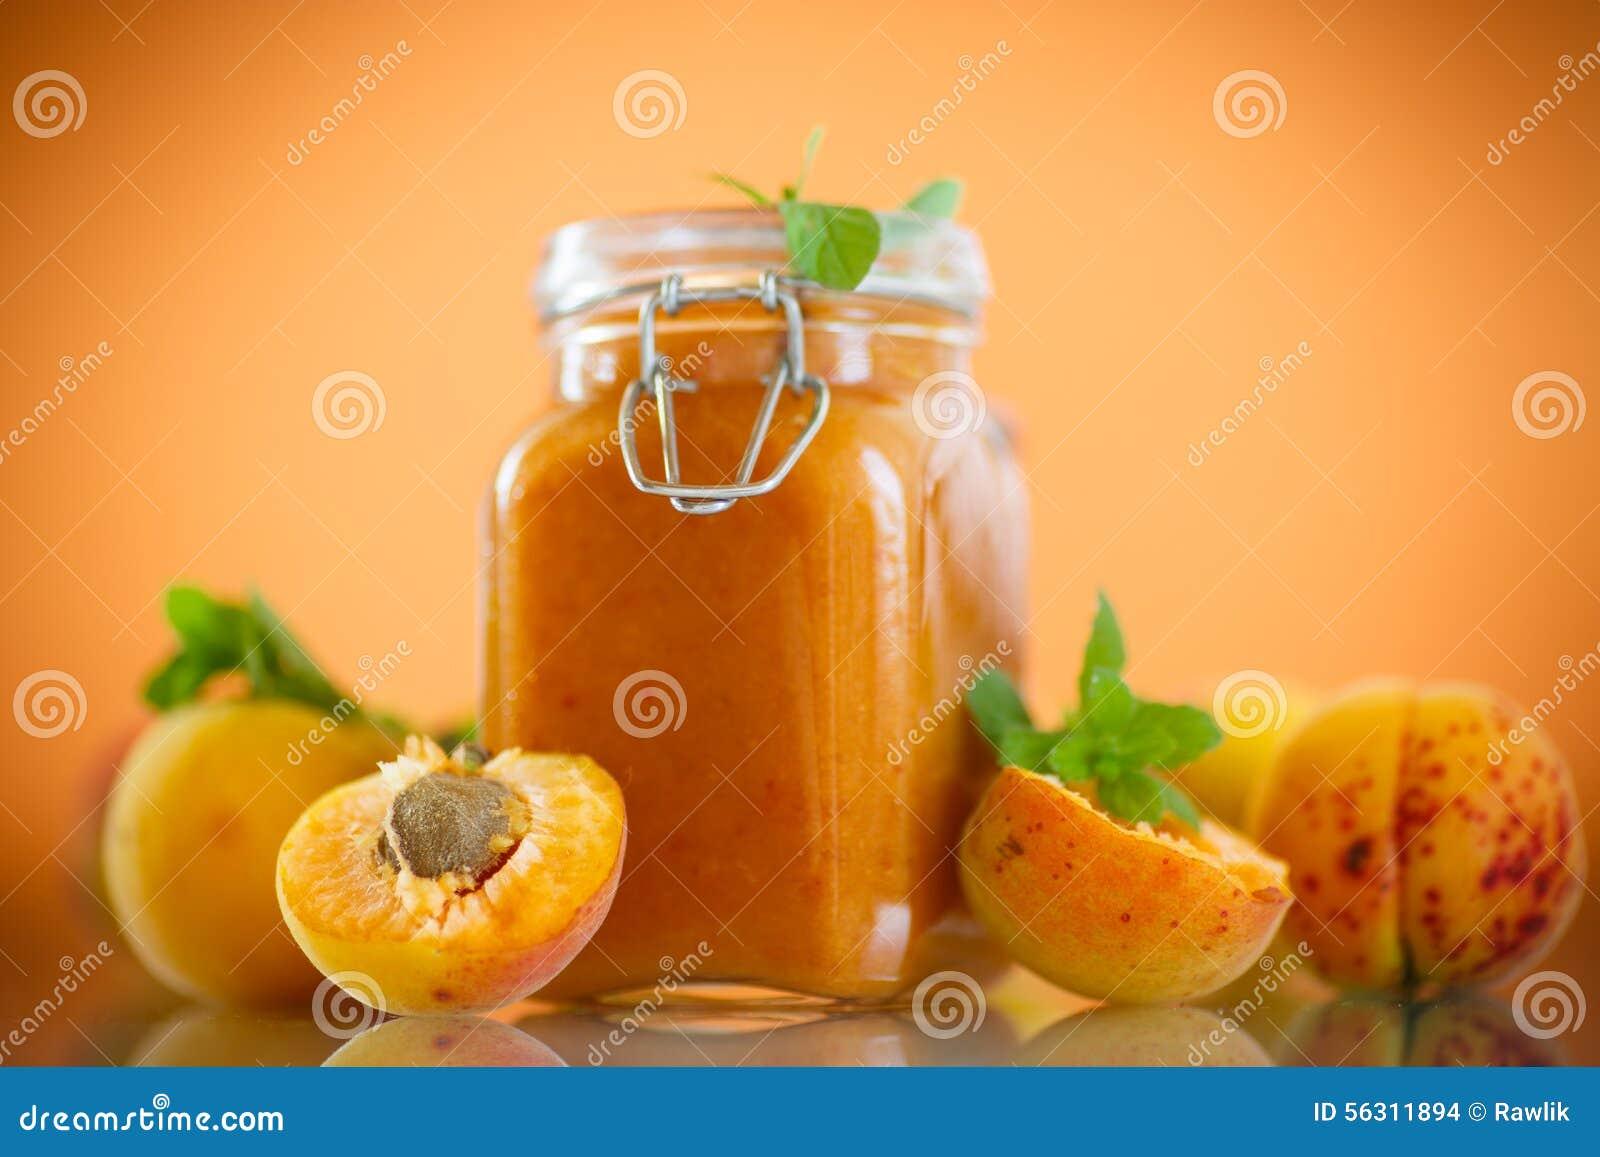 Aprikosenmarmelade